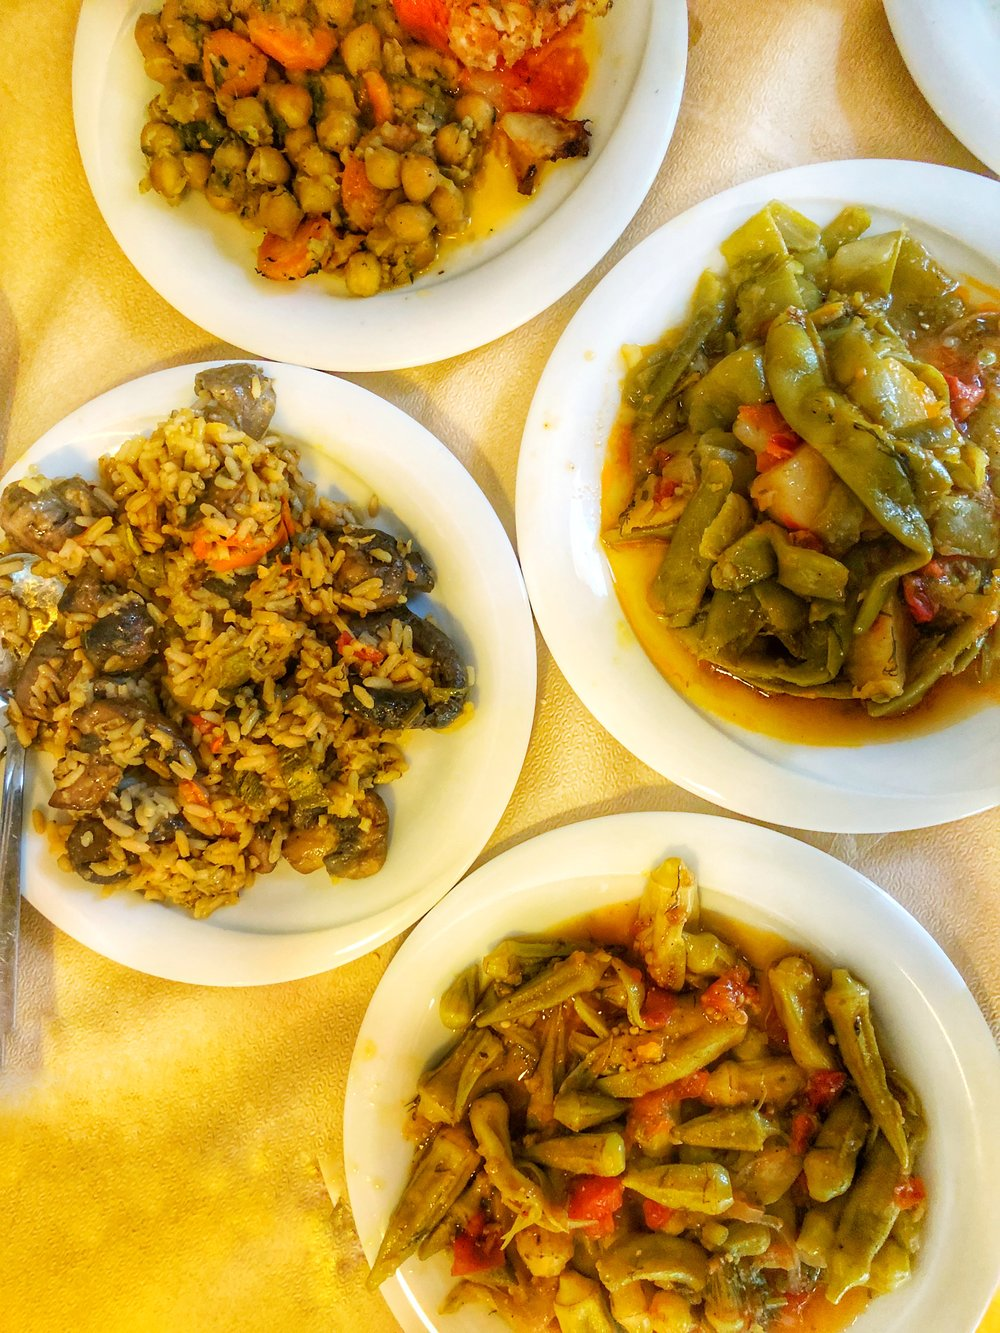 Chickpeas, mushroom rice, green beans, okra @ 5Phi (Διοχάρους 31 161 21 Kaisarianí, Attica)